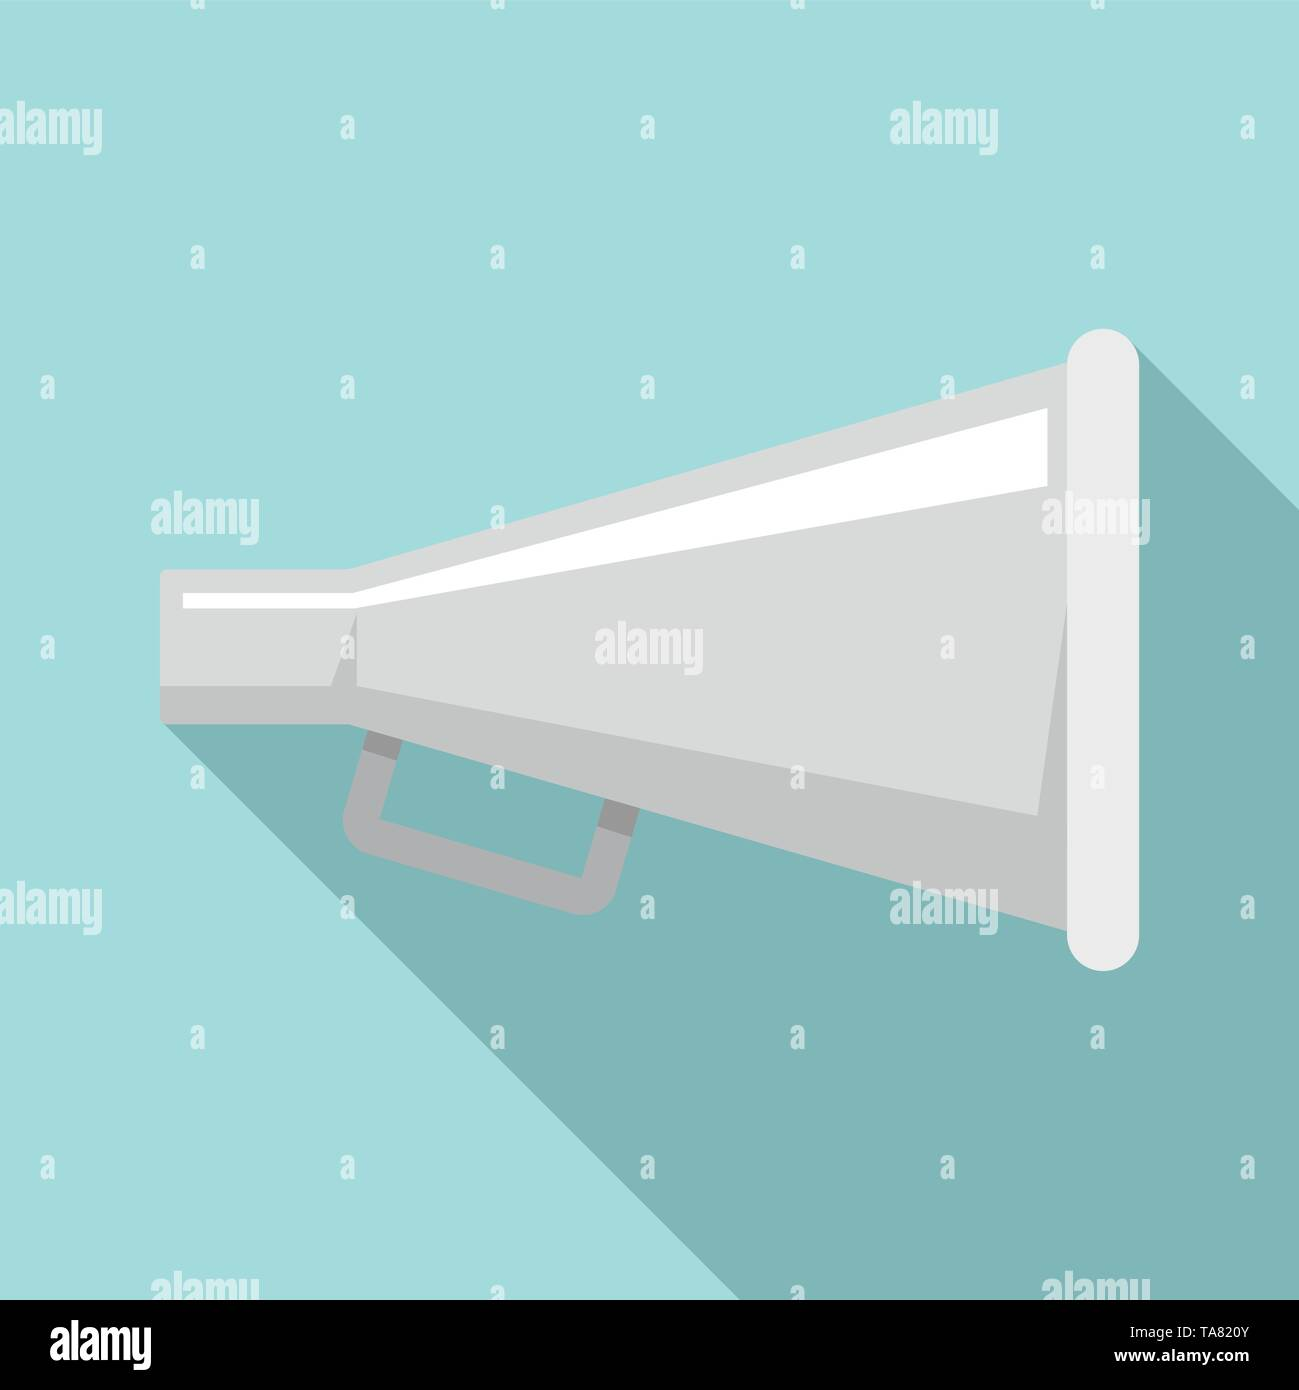 Cinema production hand speaker icon. Flat illustration of cinema production hand speaker vector icon for web design - Stock Image